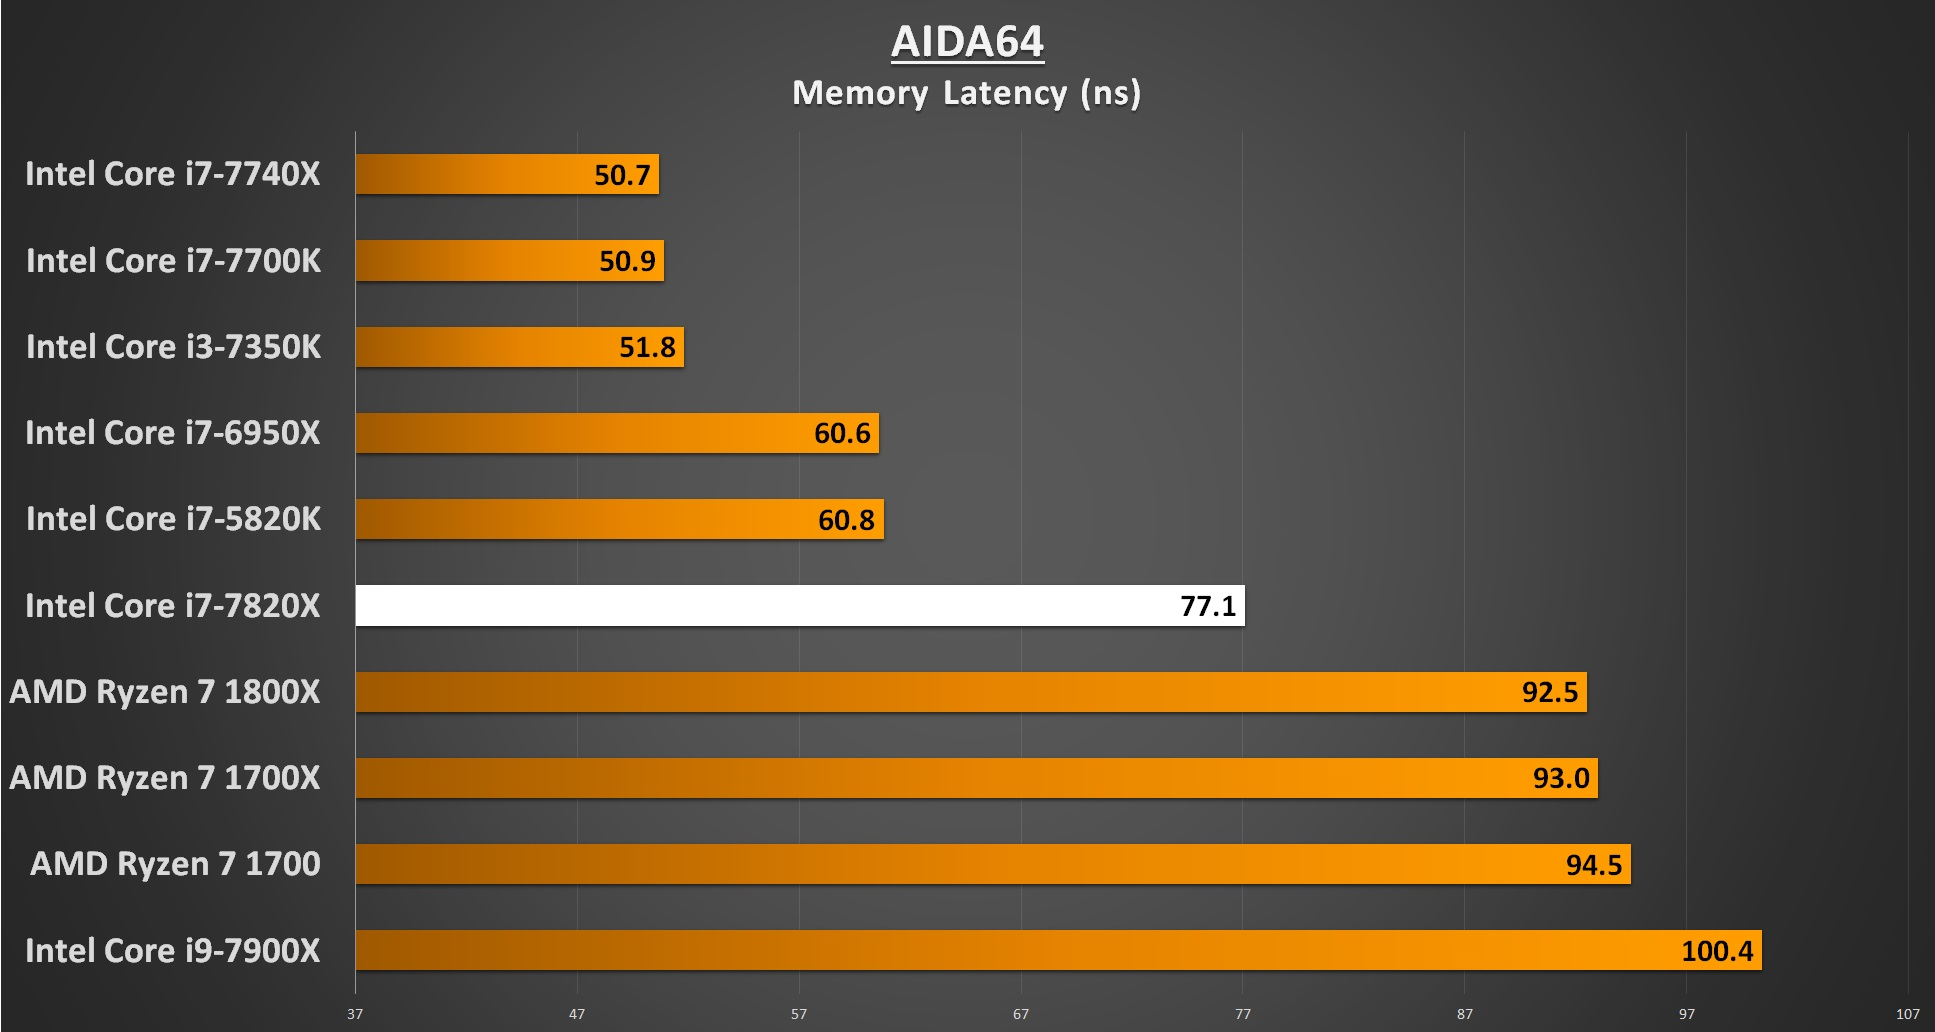 AIDA64 Memory Latency - i7-7820X Performance